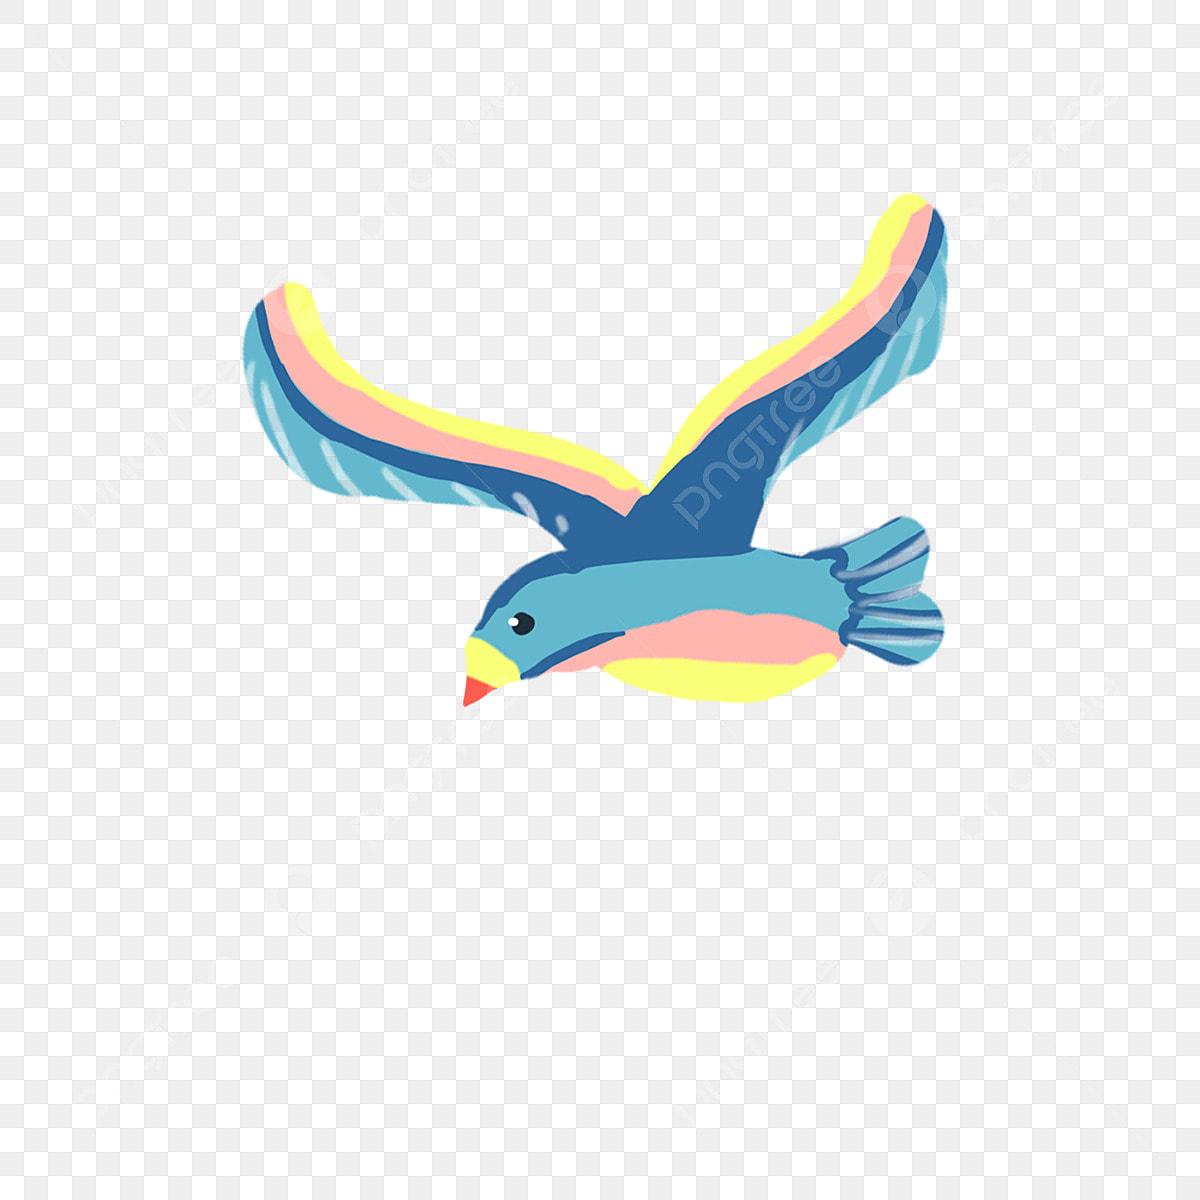 Kartun Binatang Burung Burung Camar Burung Burung Burung